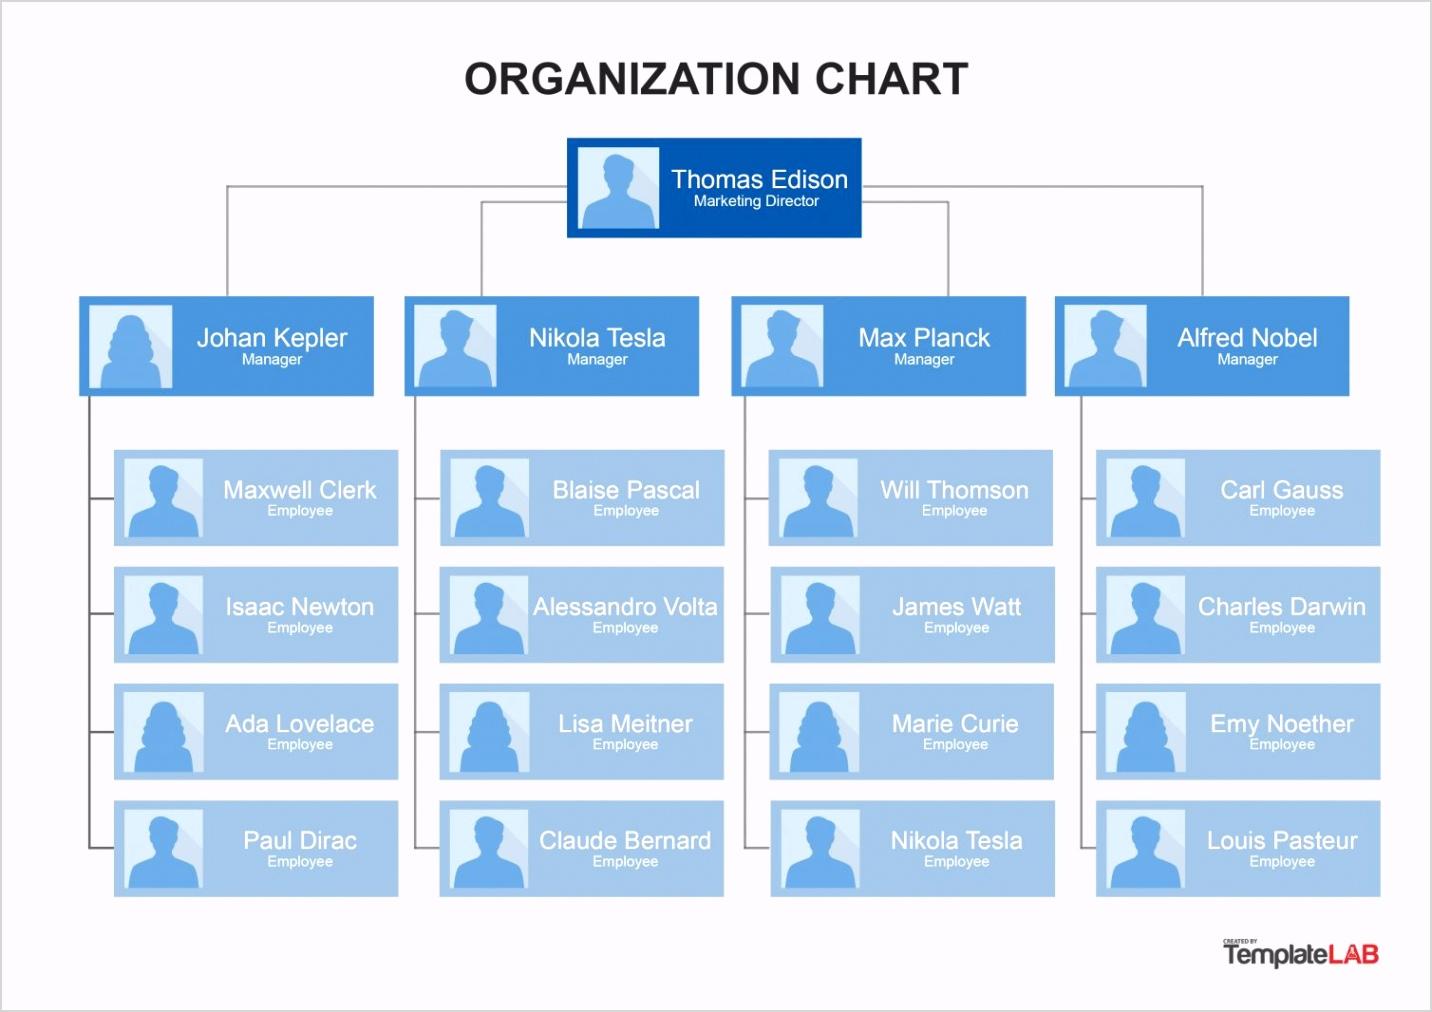 Organization Chart Template 8 TemplateLab e